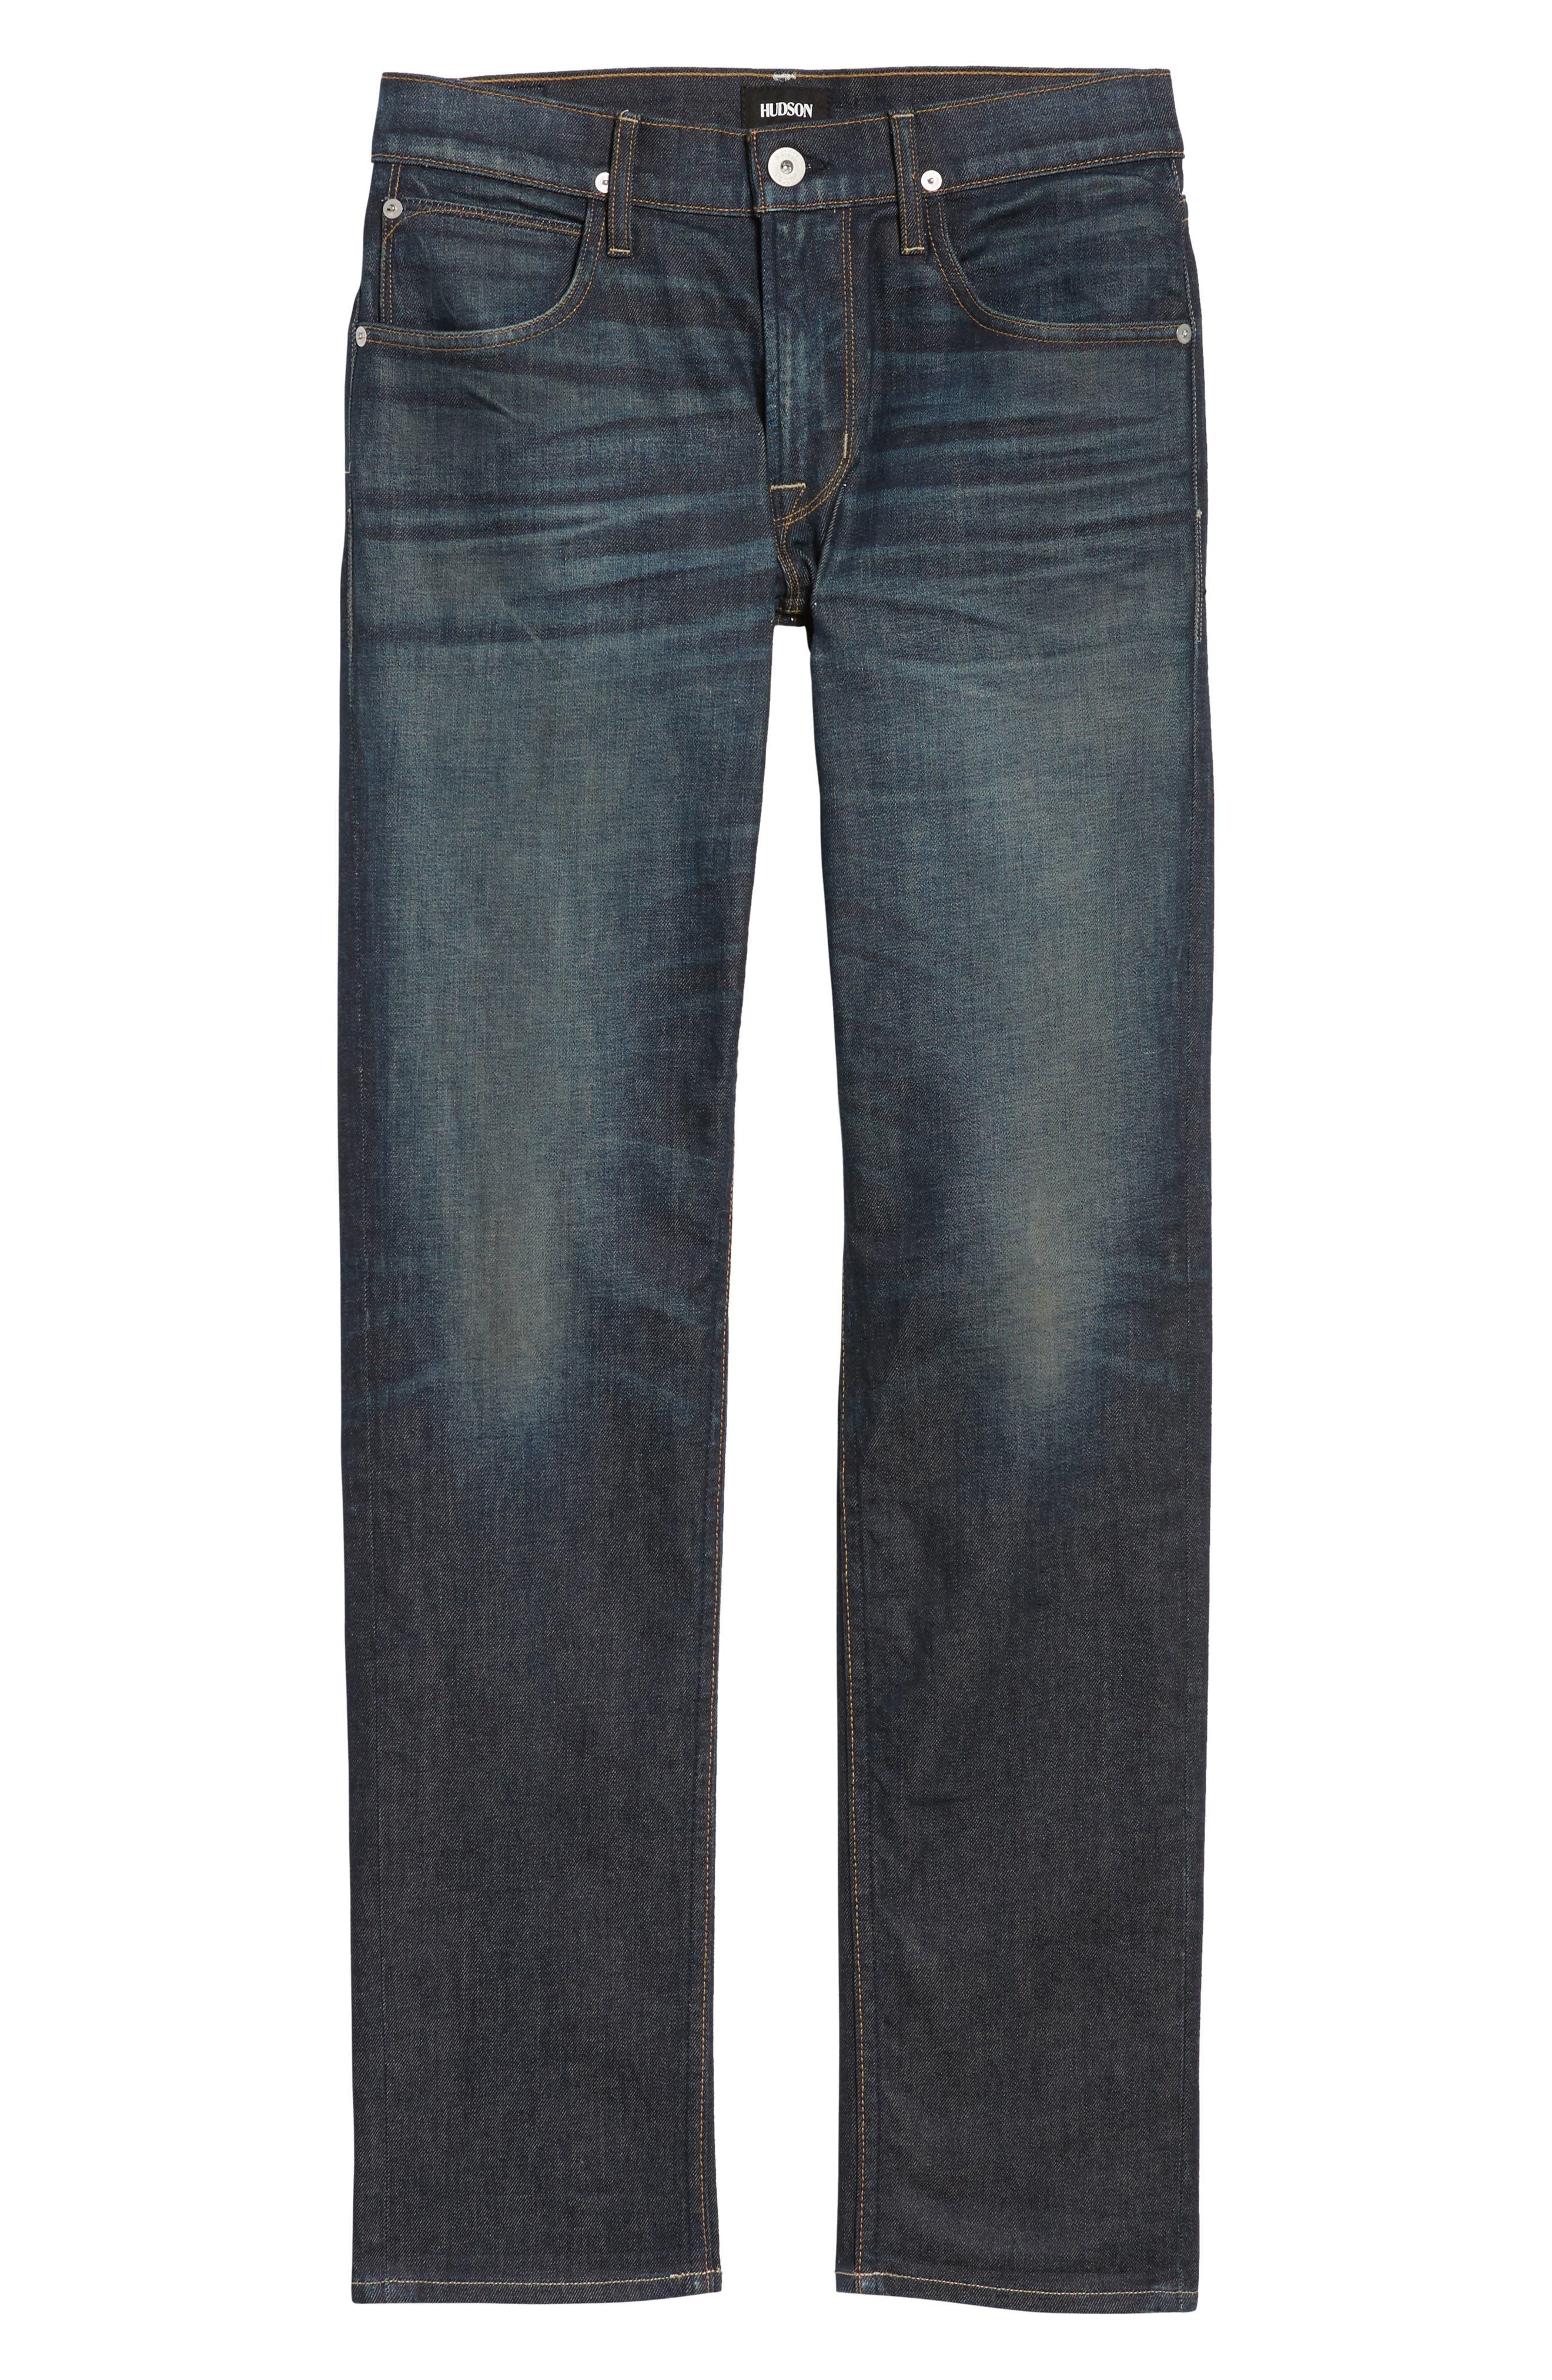 Blake Slim Fit Jeans,                             Alternate thumbnail 6, color,                             420